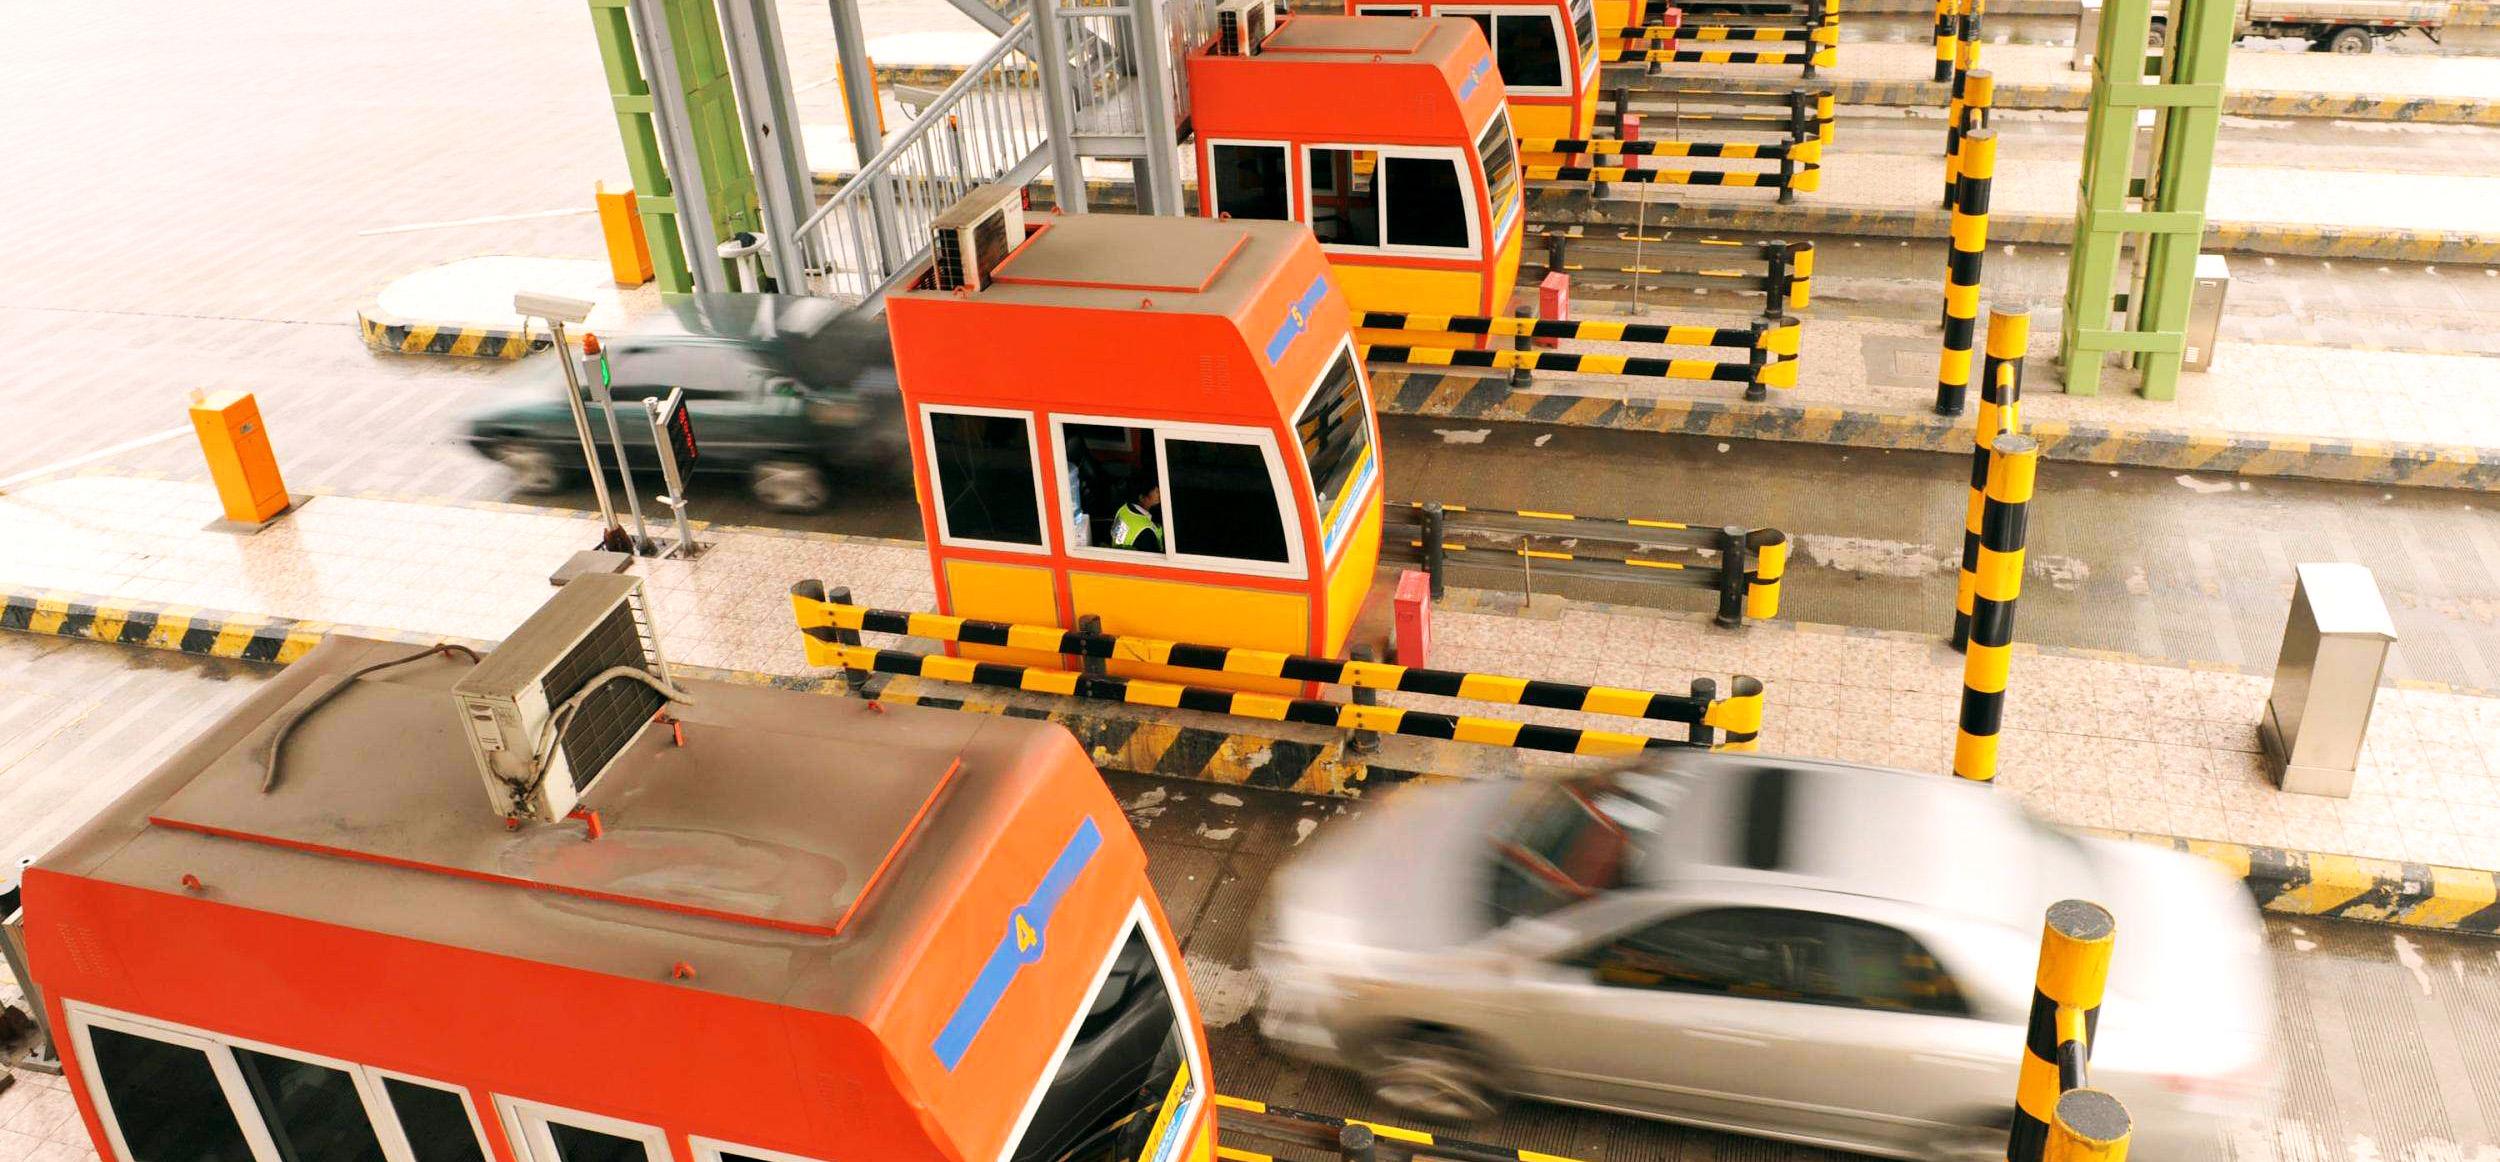 lusdetector verkeersregelsysteem